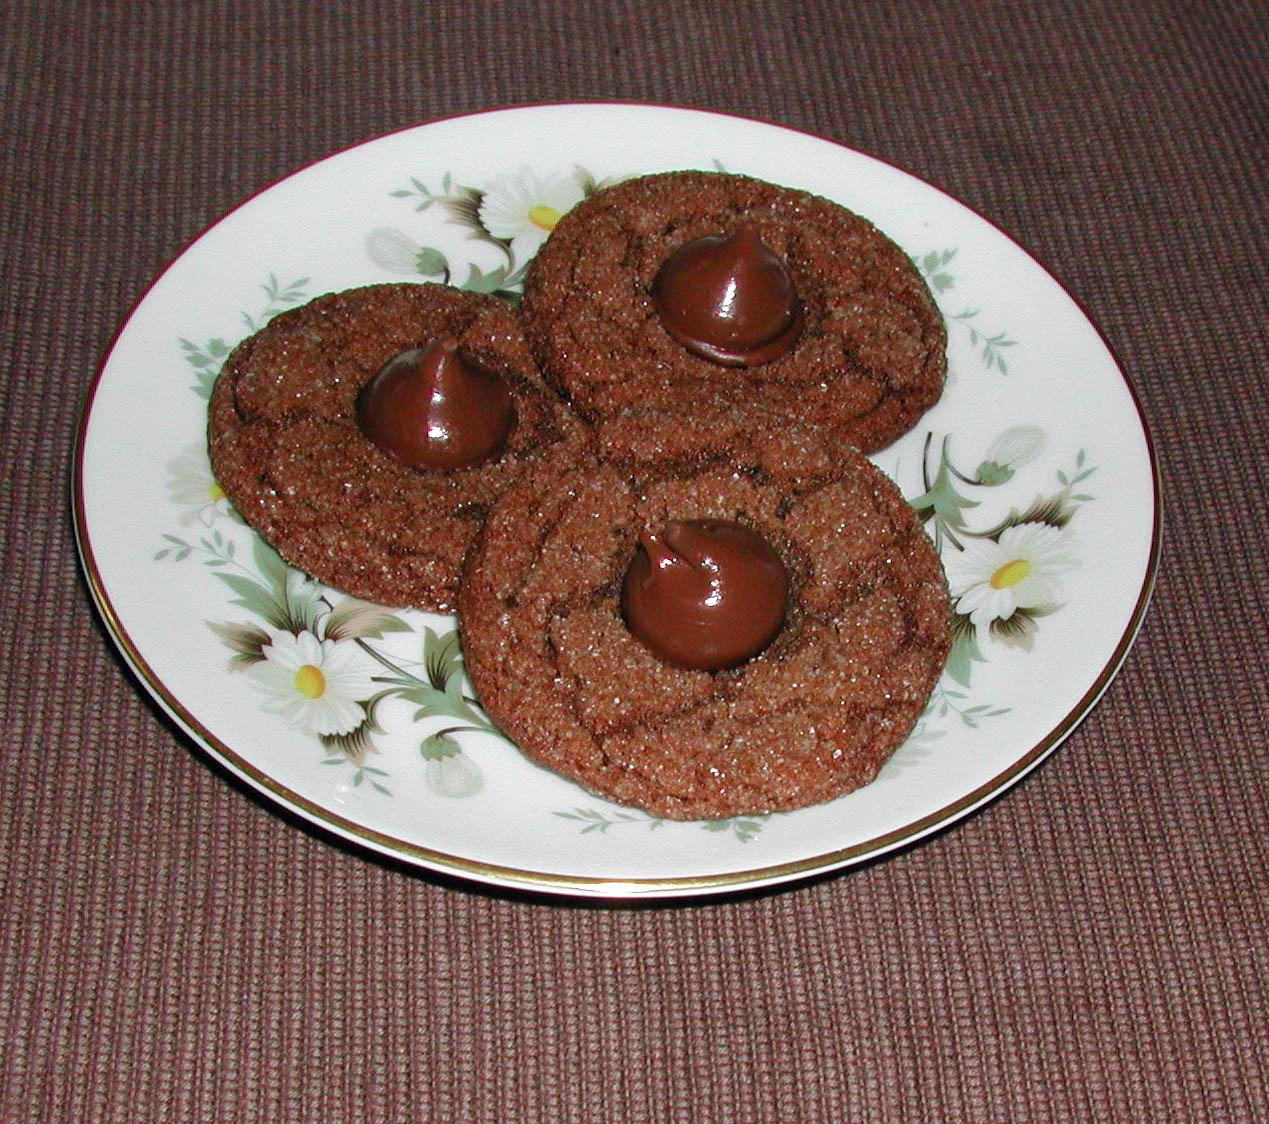 Chocolate Orange Peels Dunmore Candy Kitchen: The Iowa Housewife: Chocolate Orange Blossoms